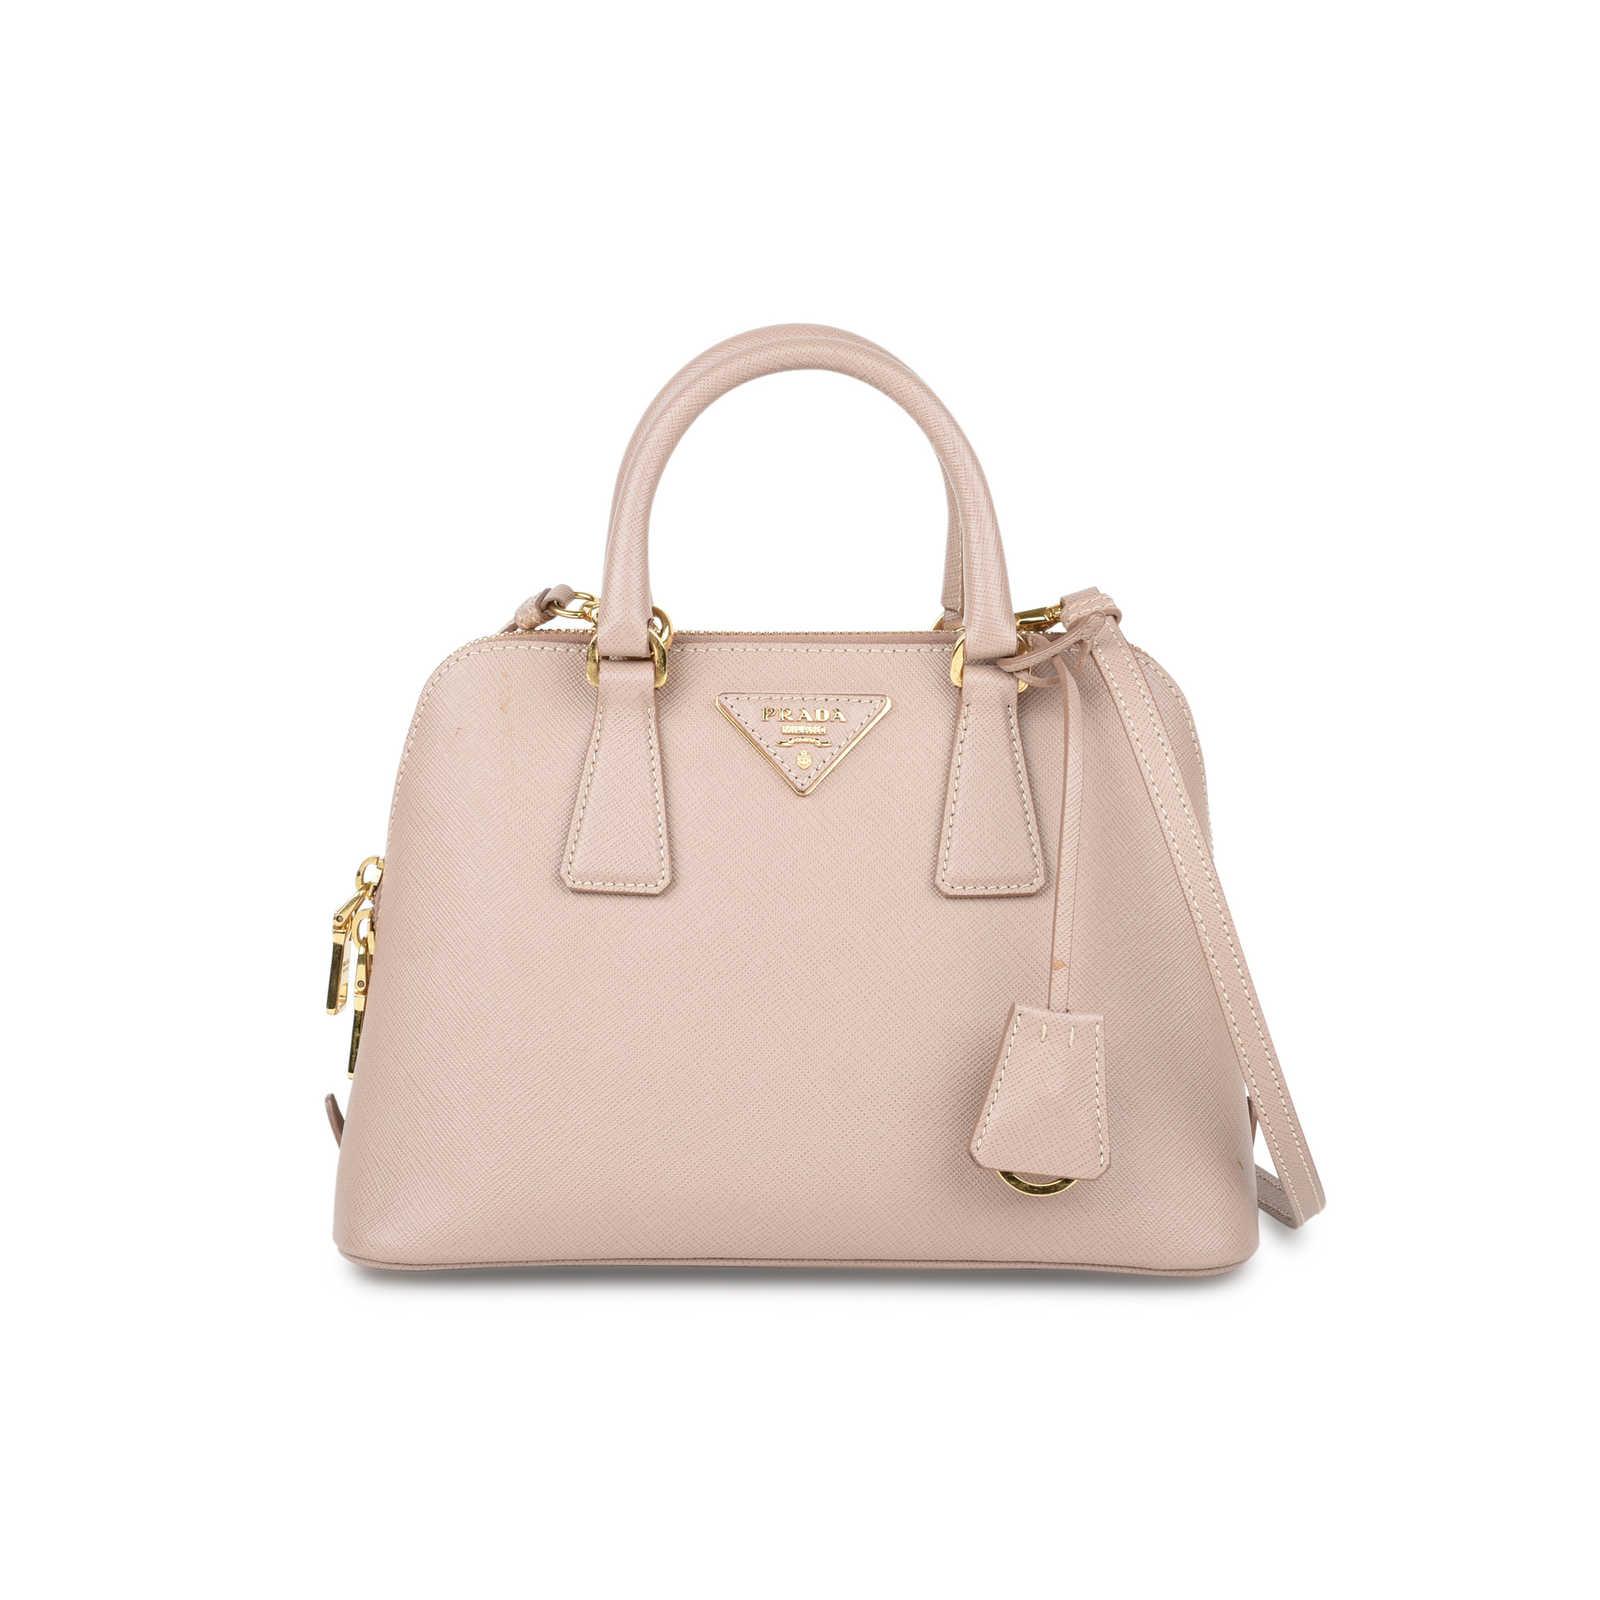 48cf9f79 Authentic Second Hand Prada Saffiano Vernice Mini Promenade Bag (PSS ...